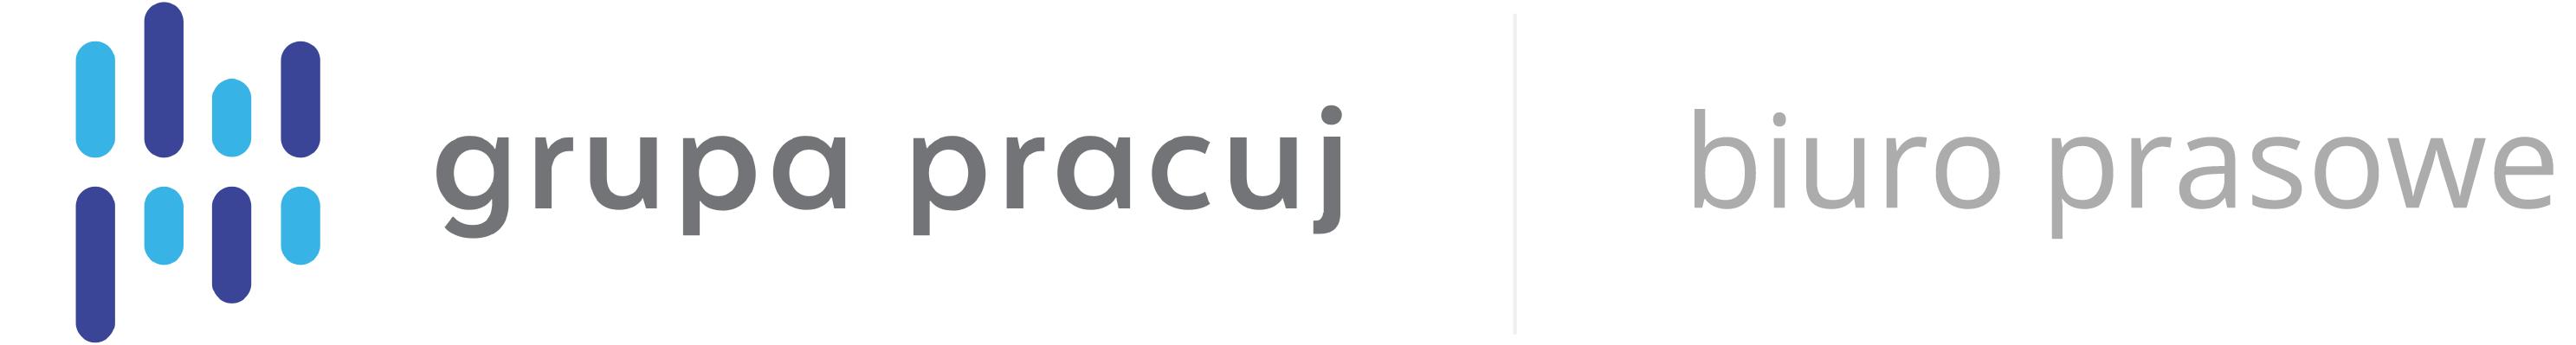 Biuro Prasowe Grupy Pracuj logo